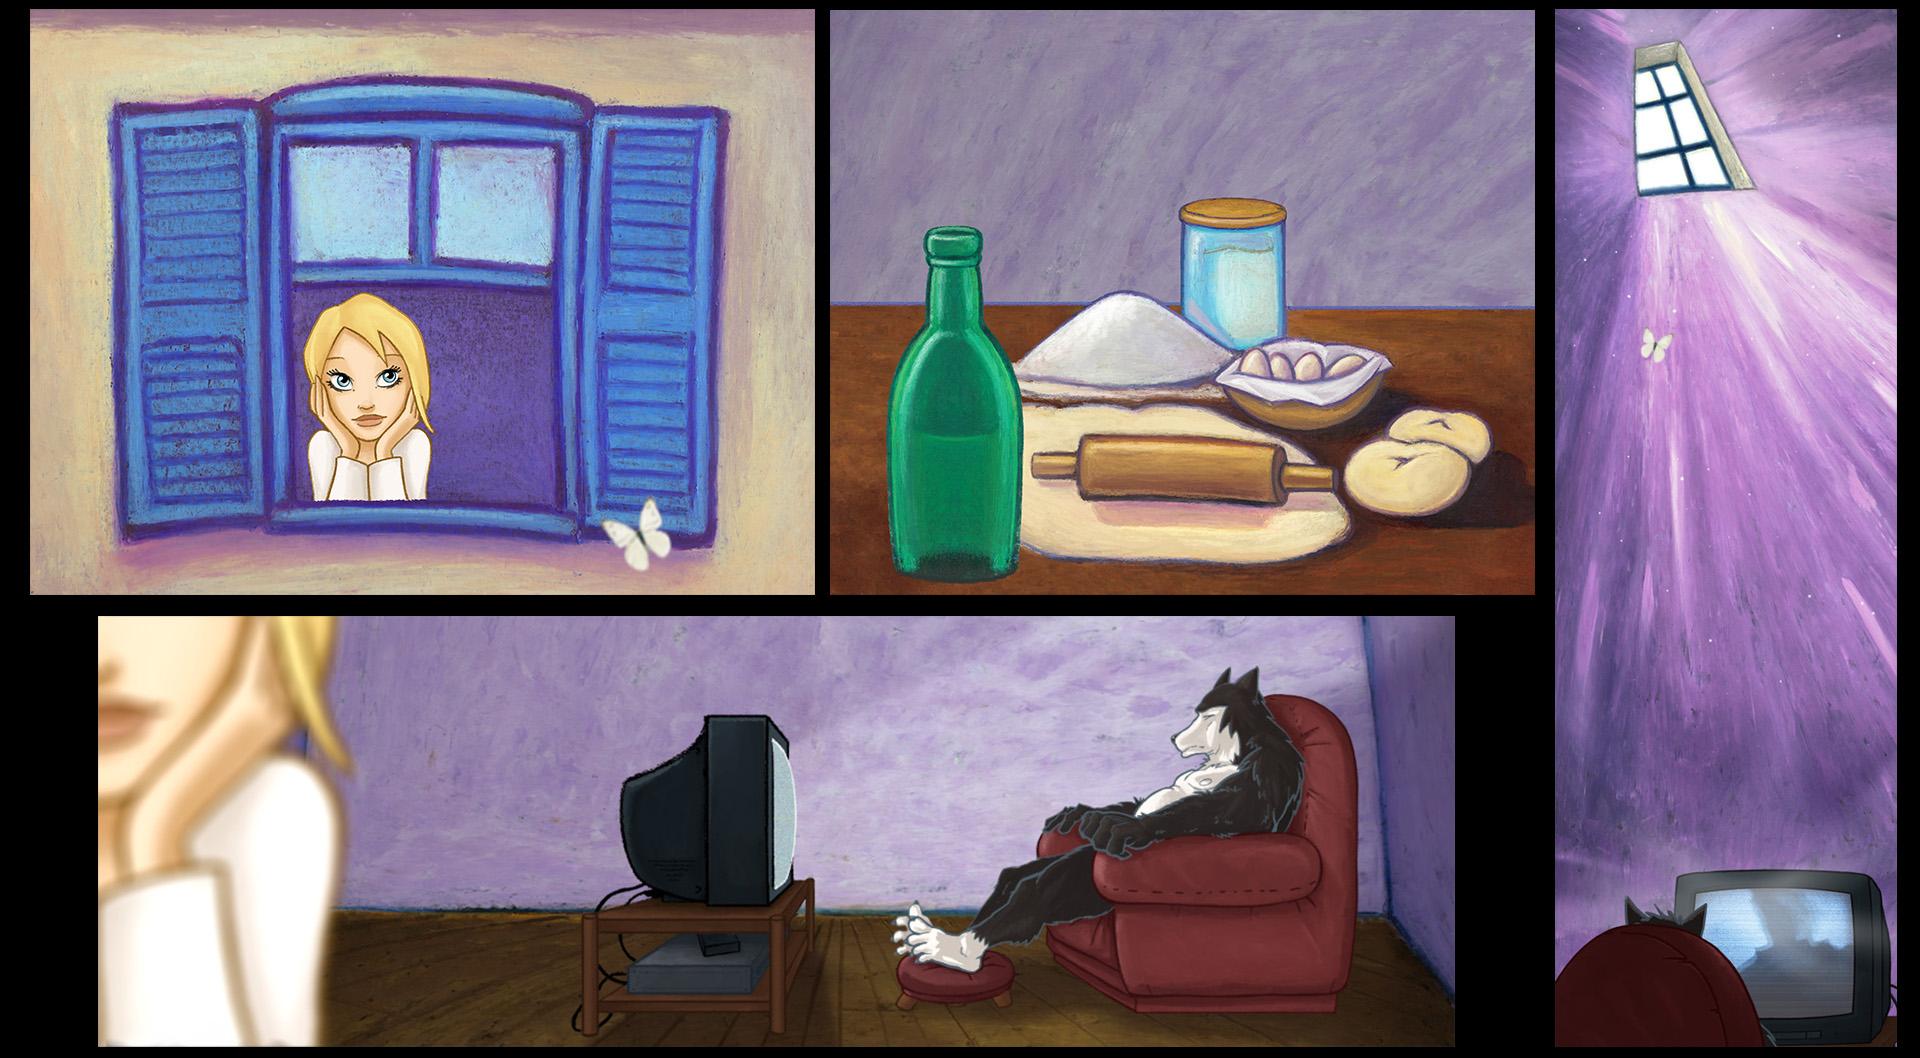 I Conflitti dell'Essere - Videoclip, scenes from the animation © Super Punch / Avvolte